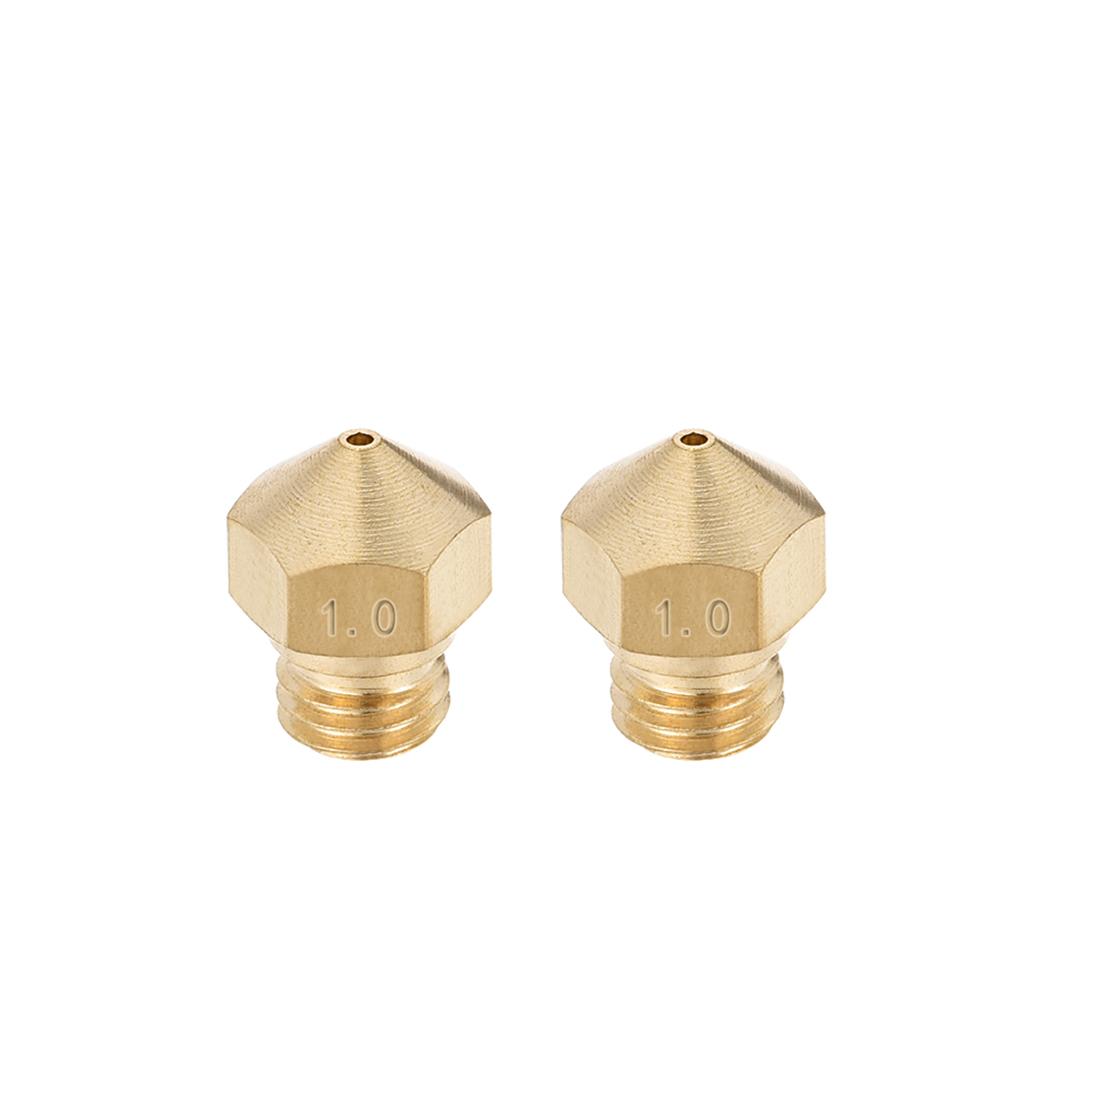 1mm 3D Printer Nozzle, Fit for MK10, for 1.75mm Filament Brass 2pcs